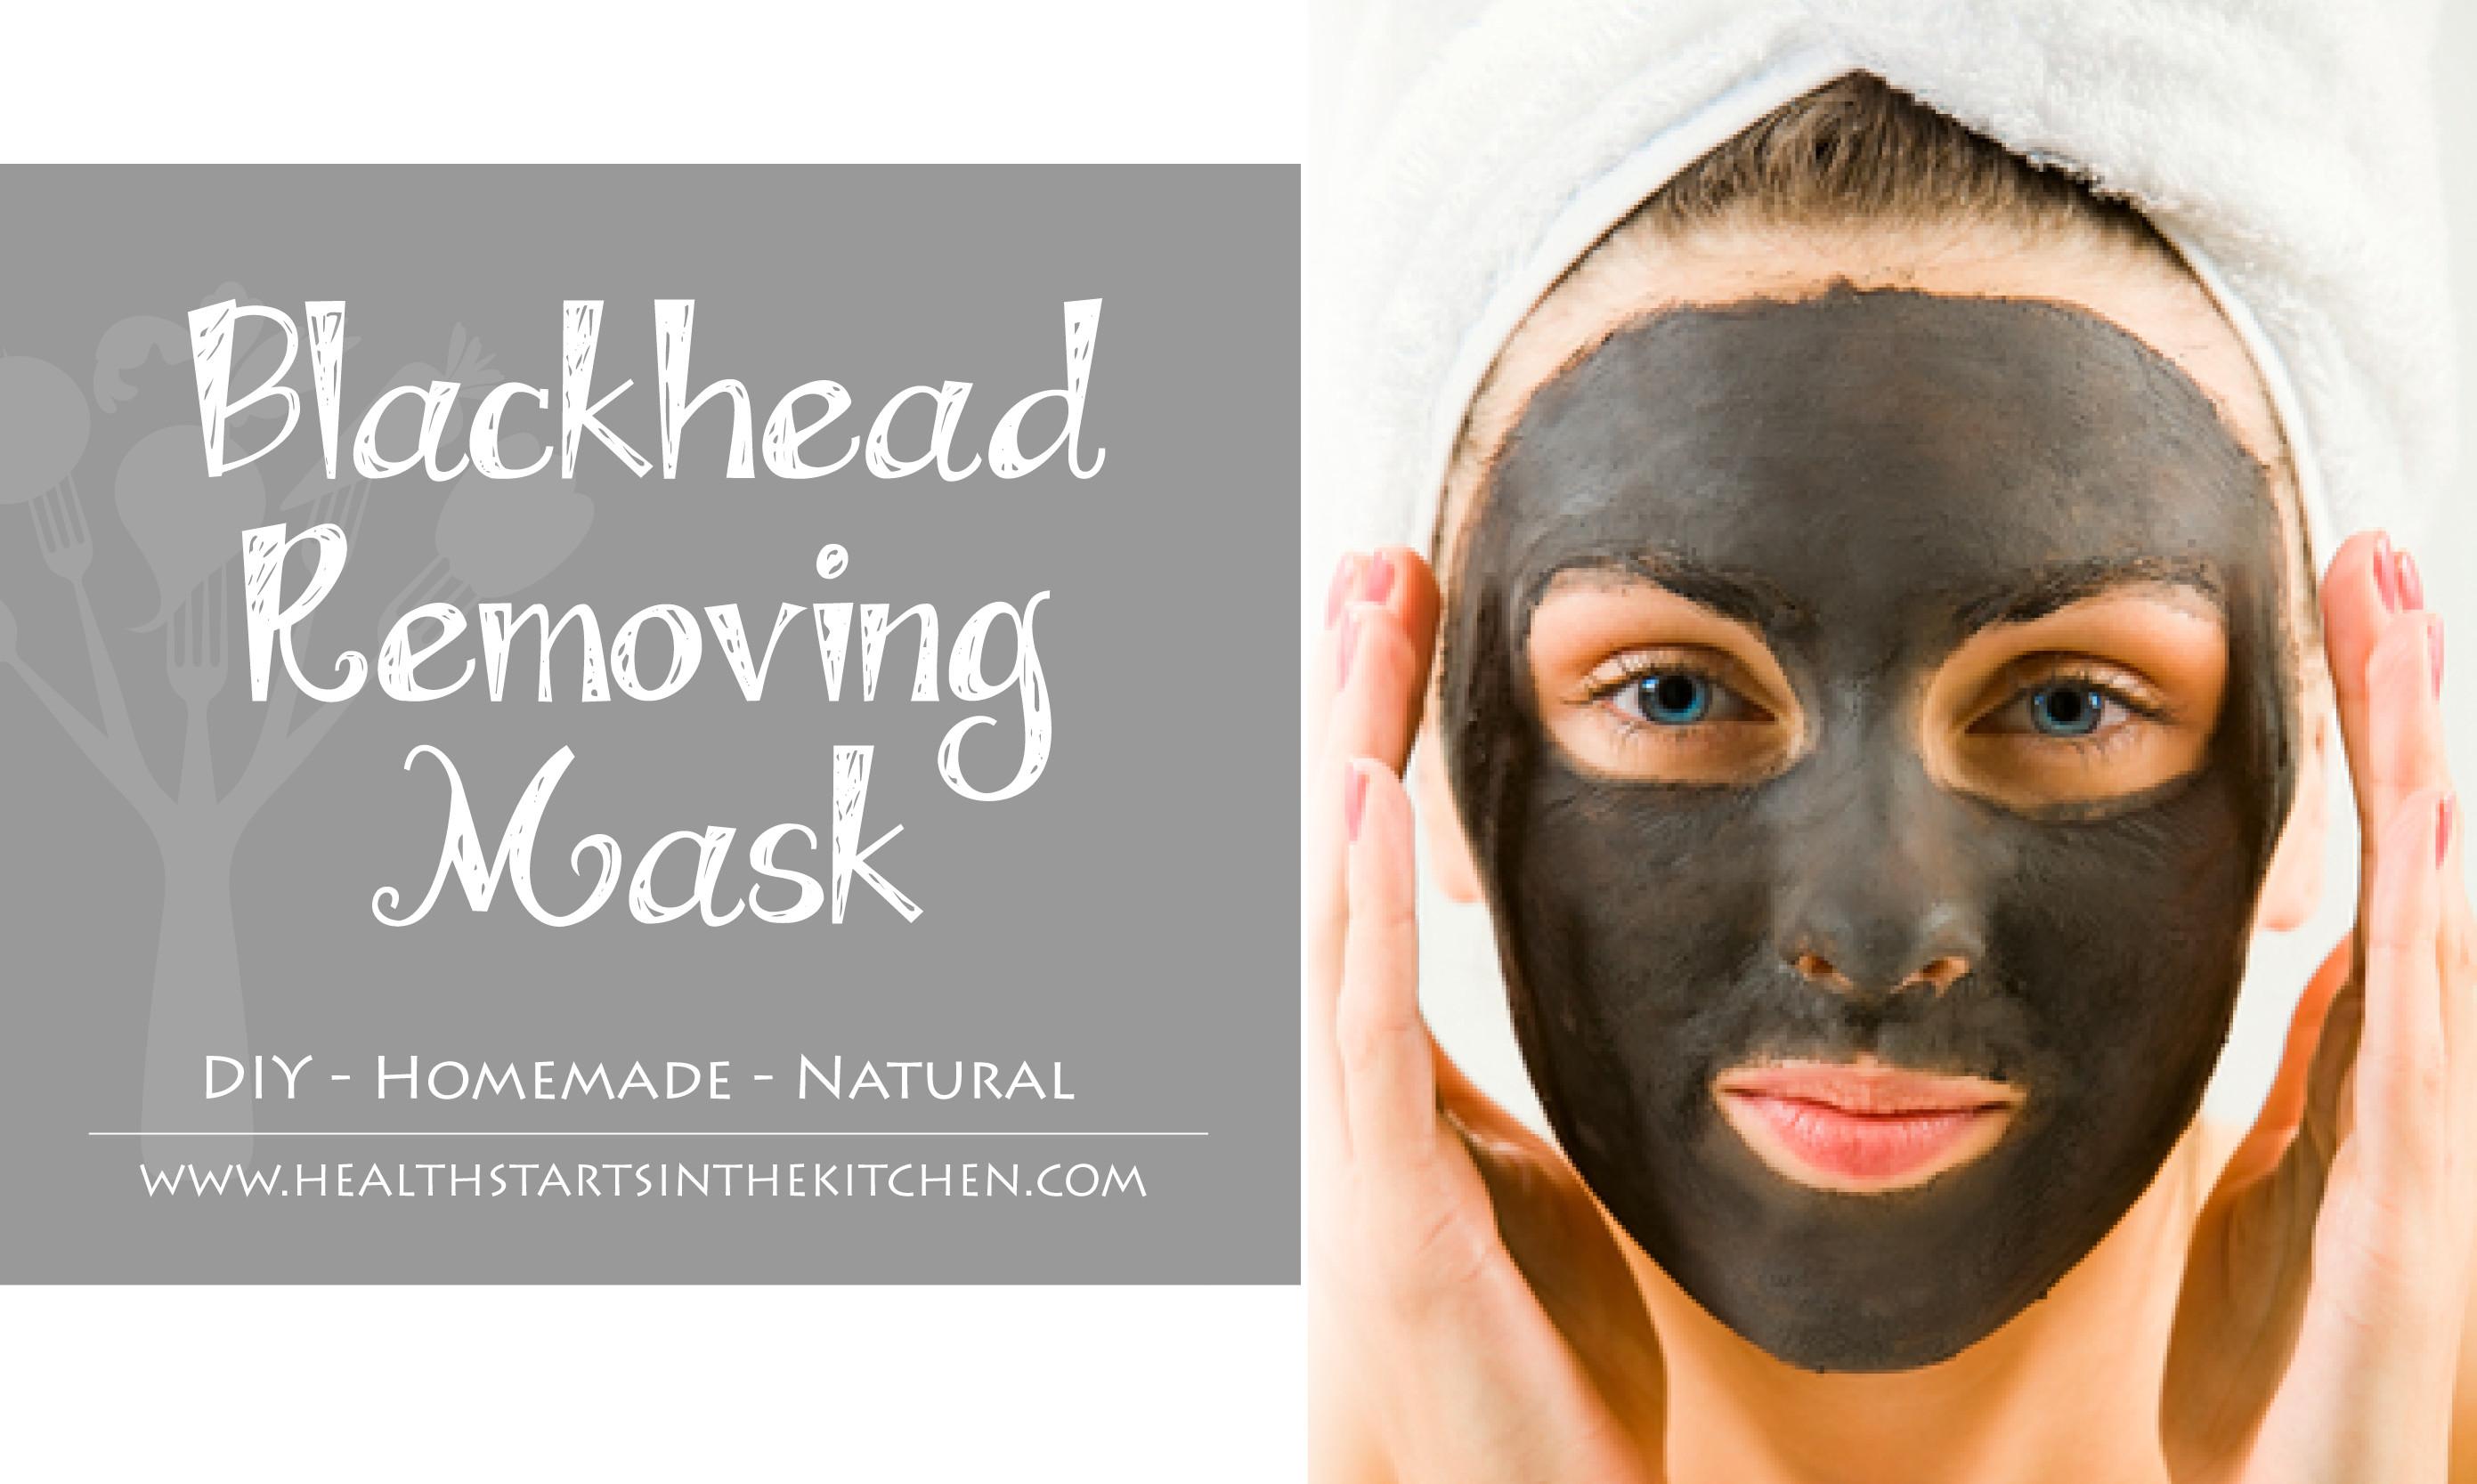 Diy Blackhead Maske  DIY Homemade Blackhead Removing Mask Health Starts in